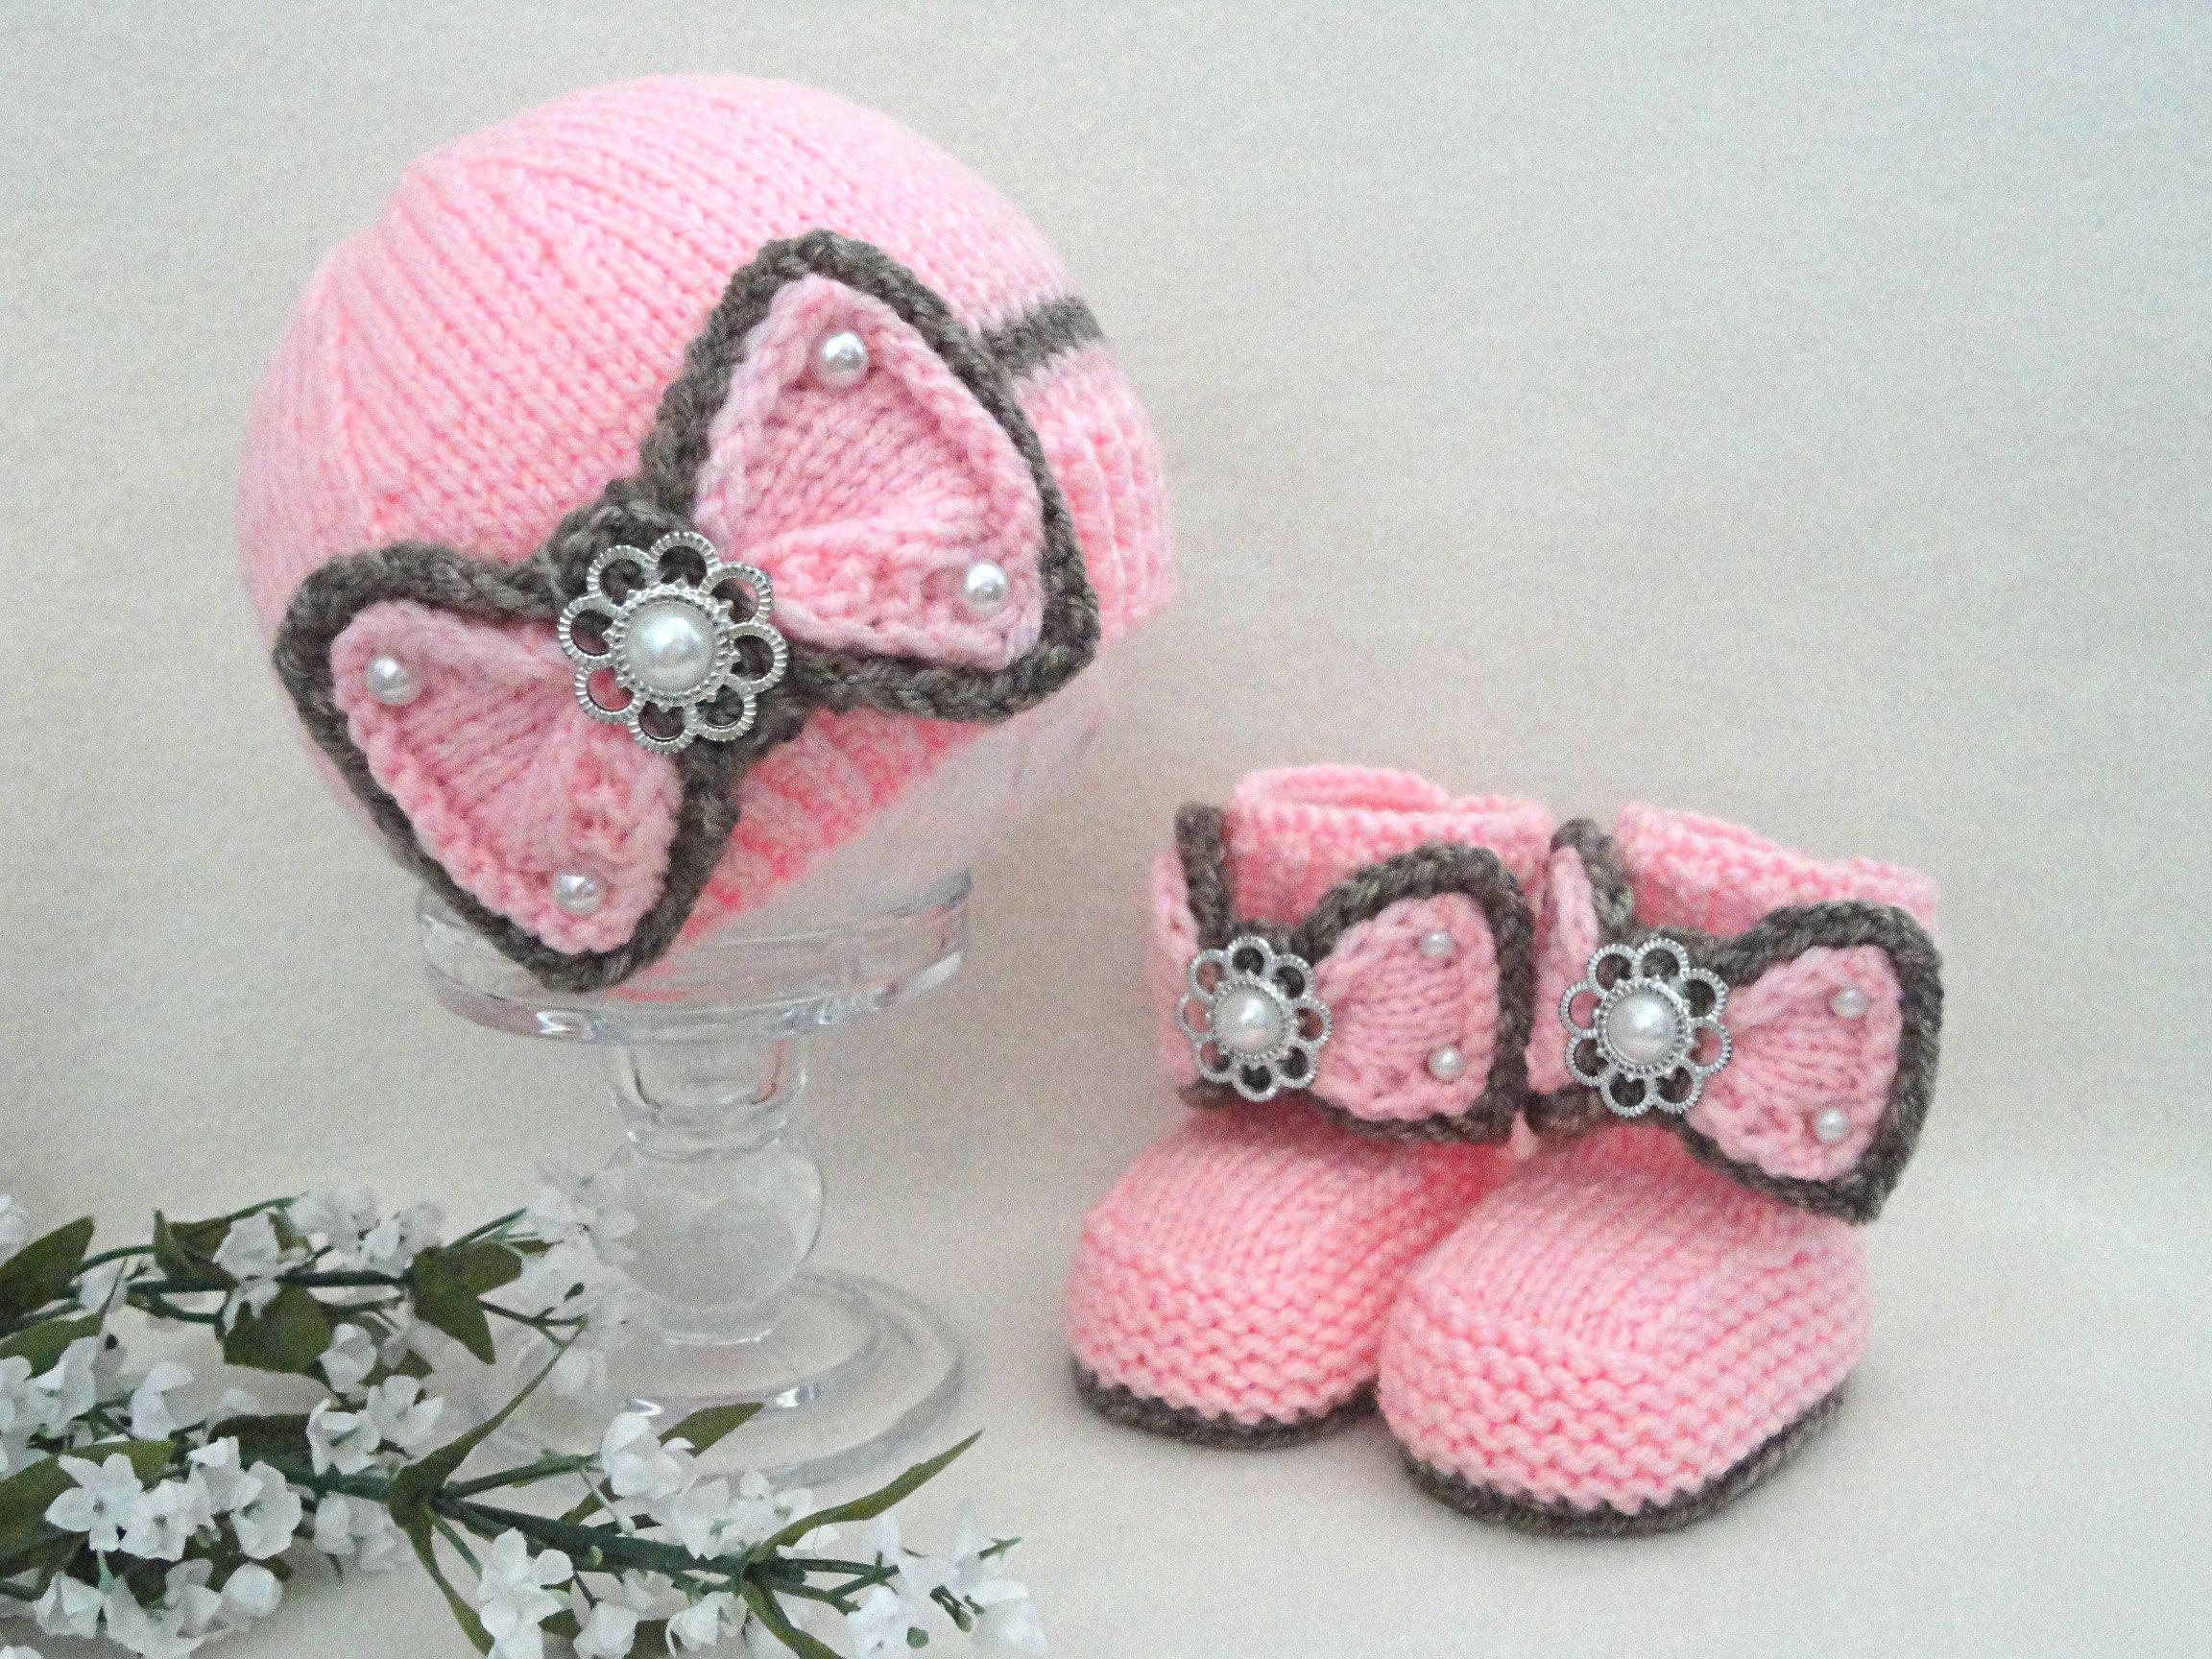 chapeau b b fille tricot bonnet b b chaussures b b etsy. Black Bedroom Furniture Sets. Home Design Ideas